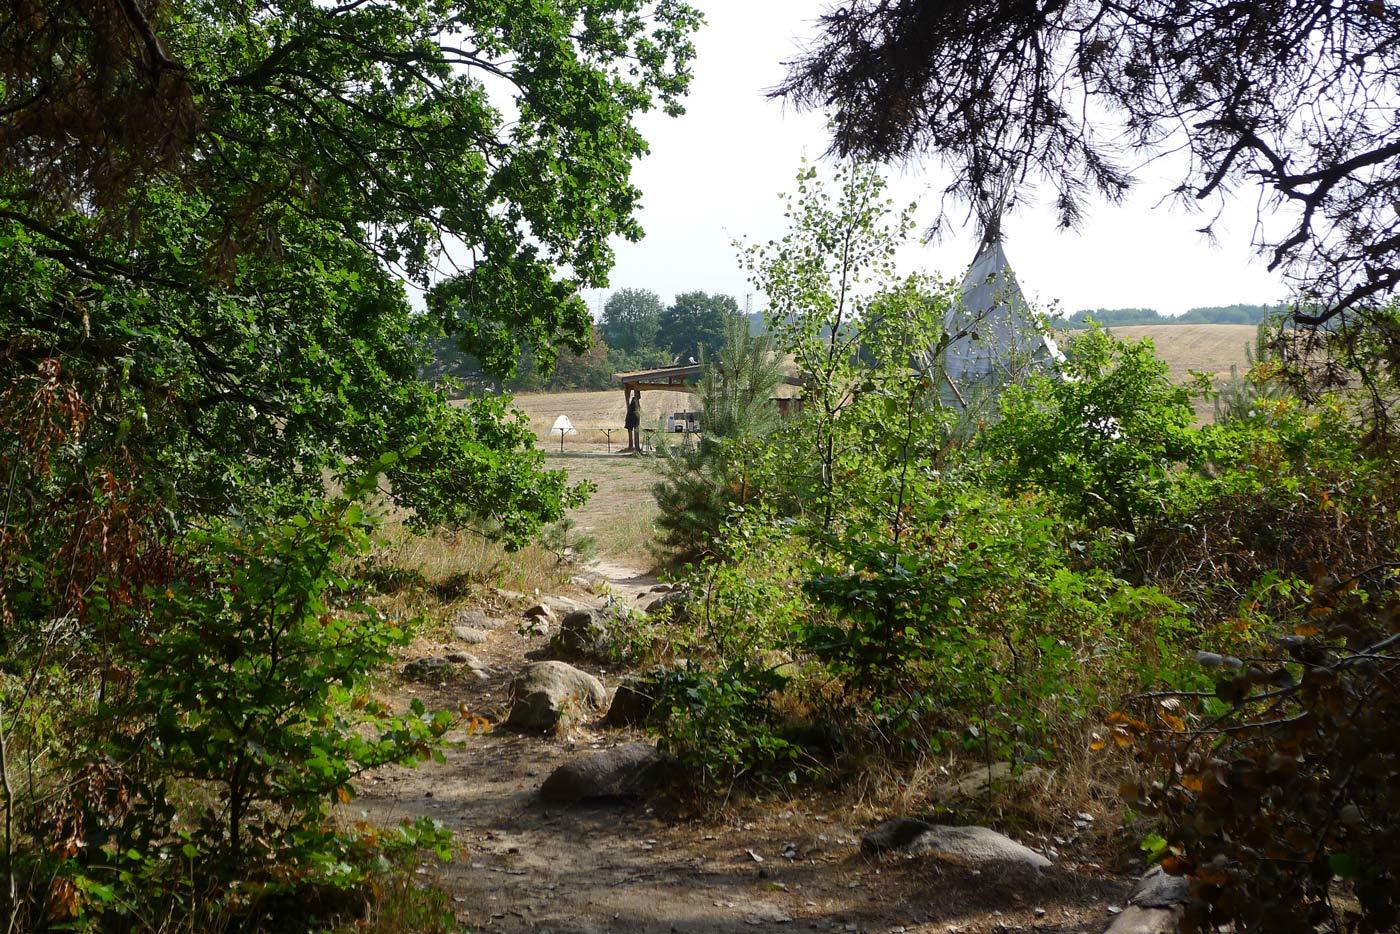 Wildnisschule-Hoher-Flaeming-Wildnisplatz-Wildnispaedagogik